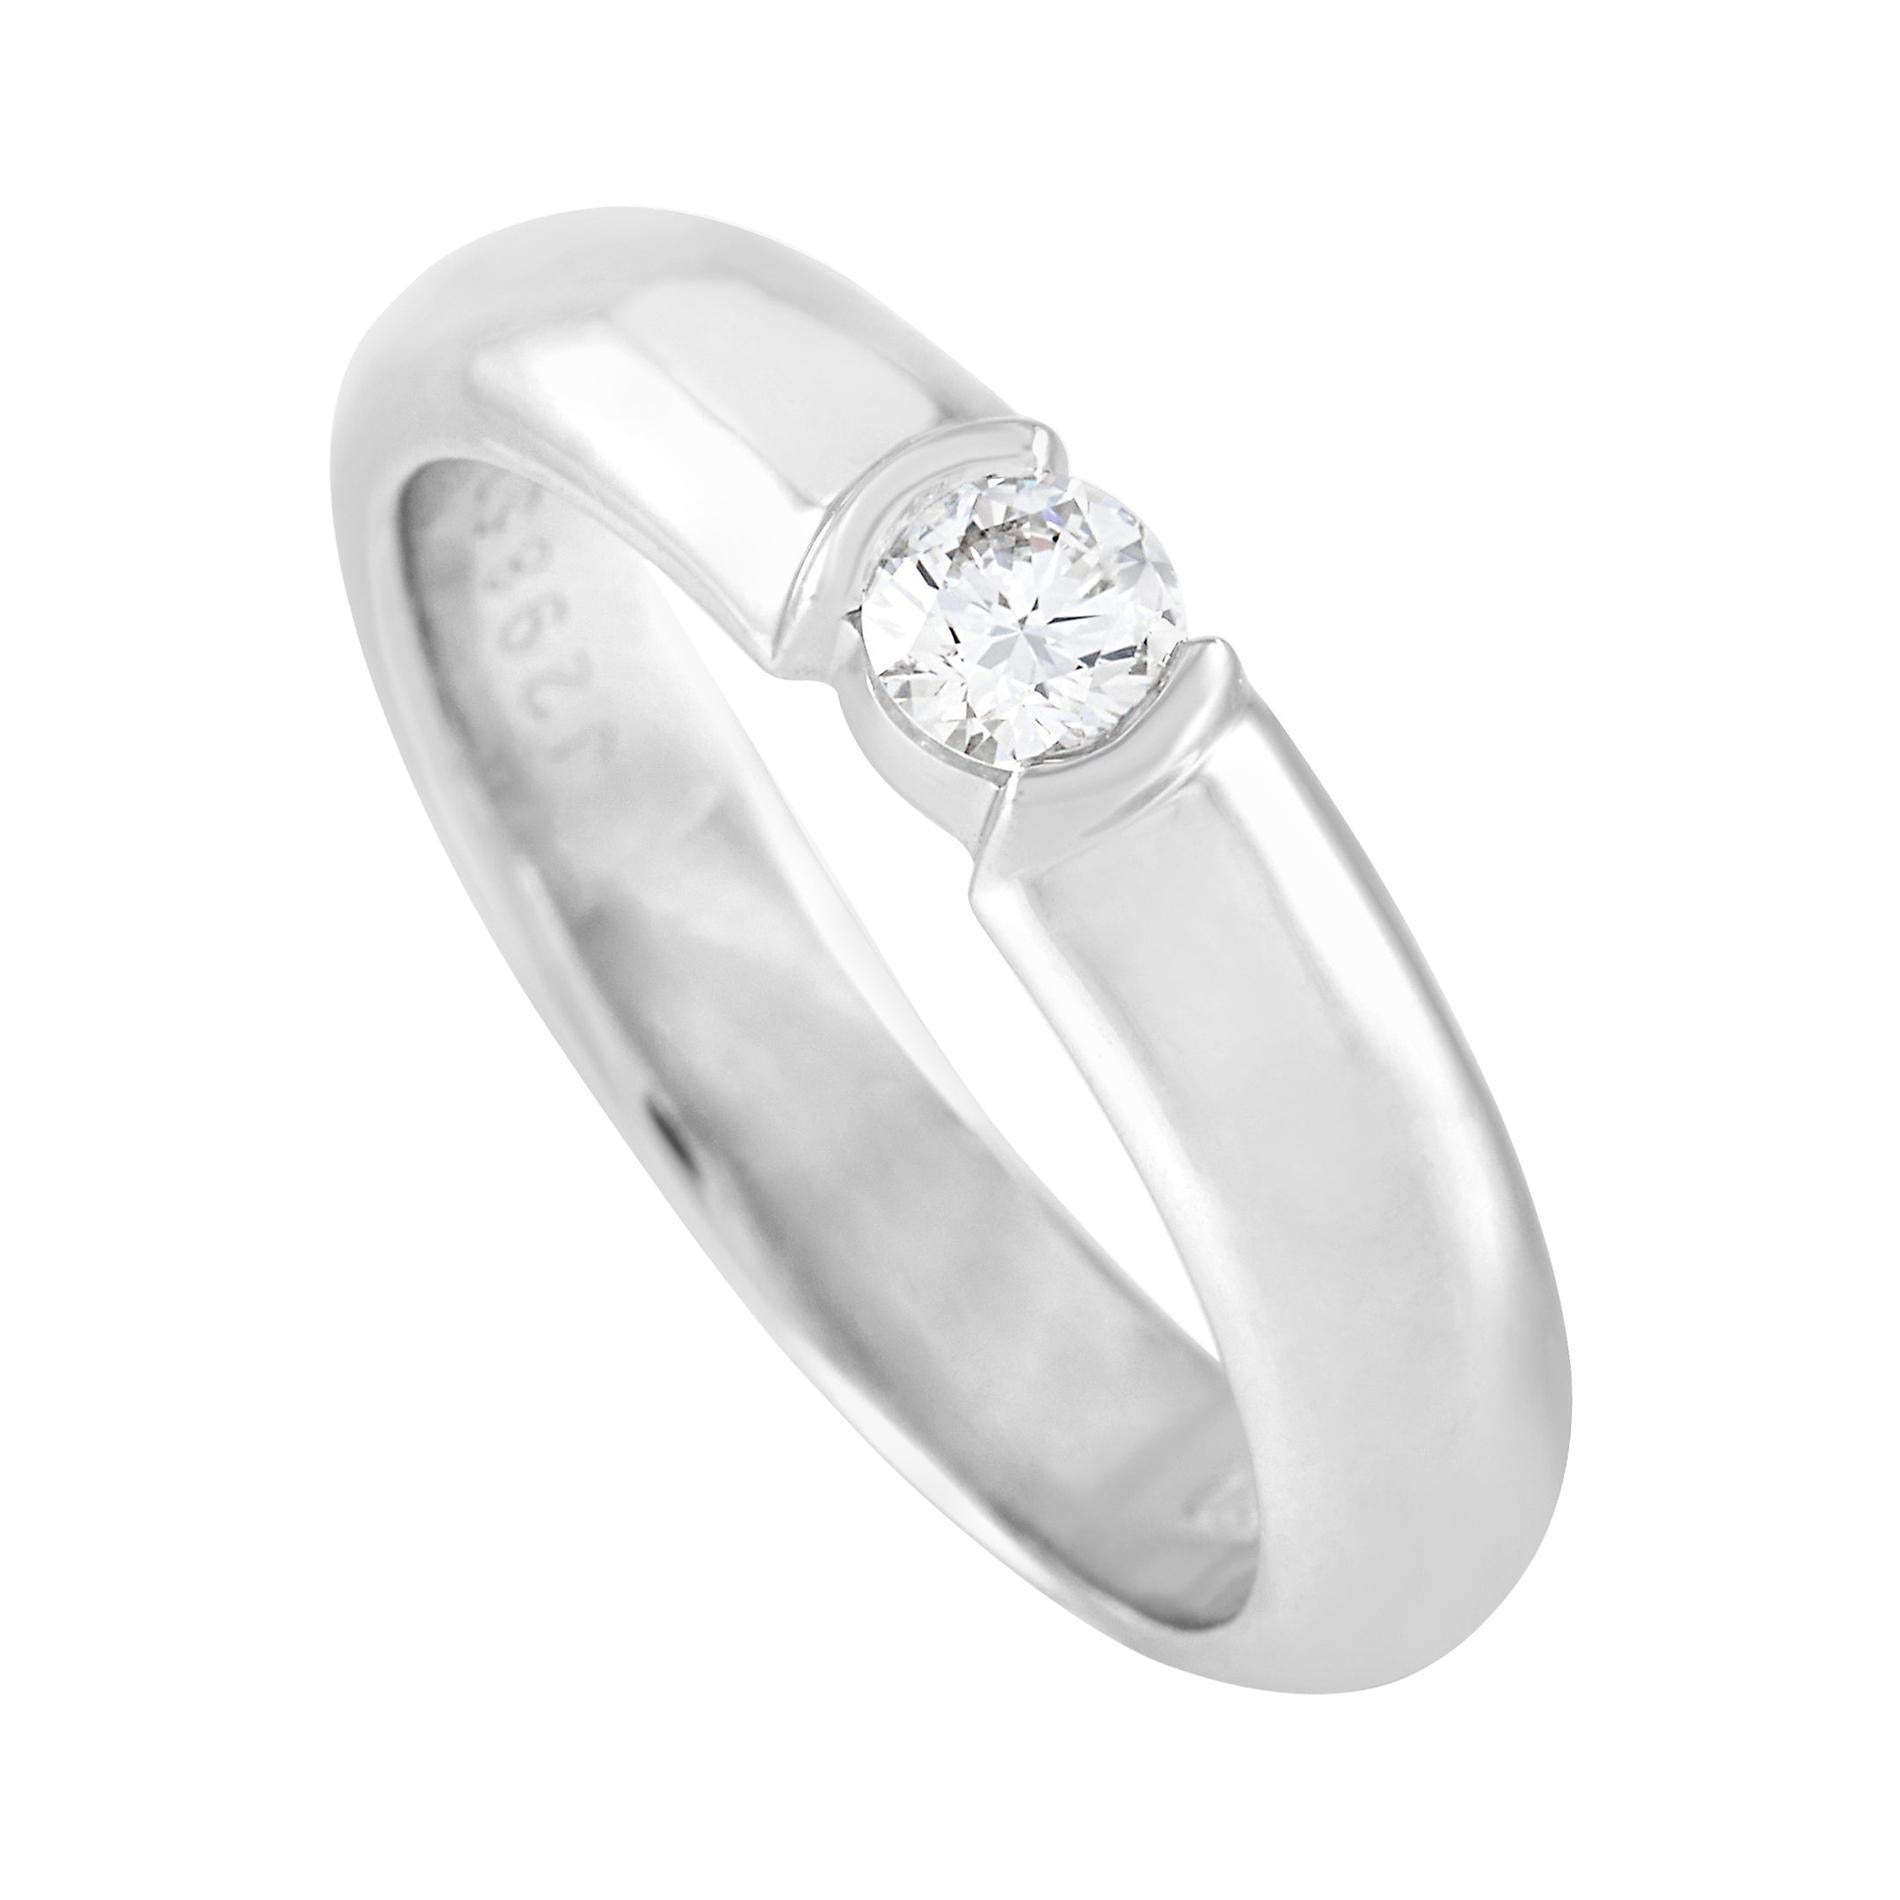 Tiffany & Co. Etoile Platinum 0.19 Ct Diamond Solitaire Ring